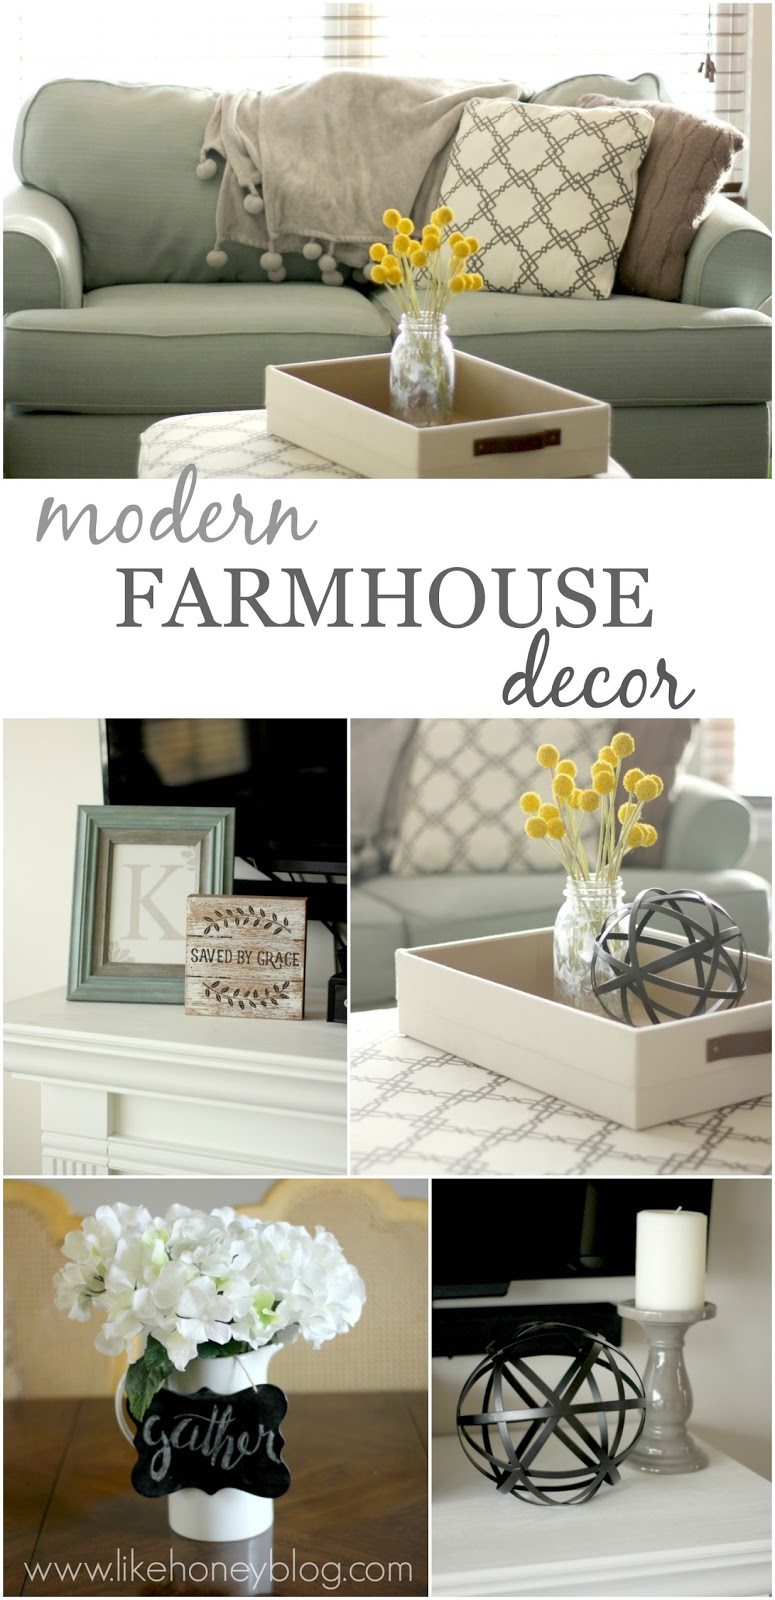 Modern Farmhouse Decor on a Budget - Like Honey